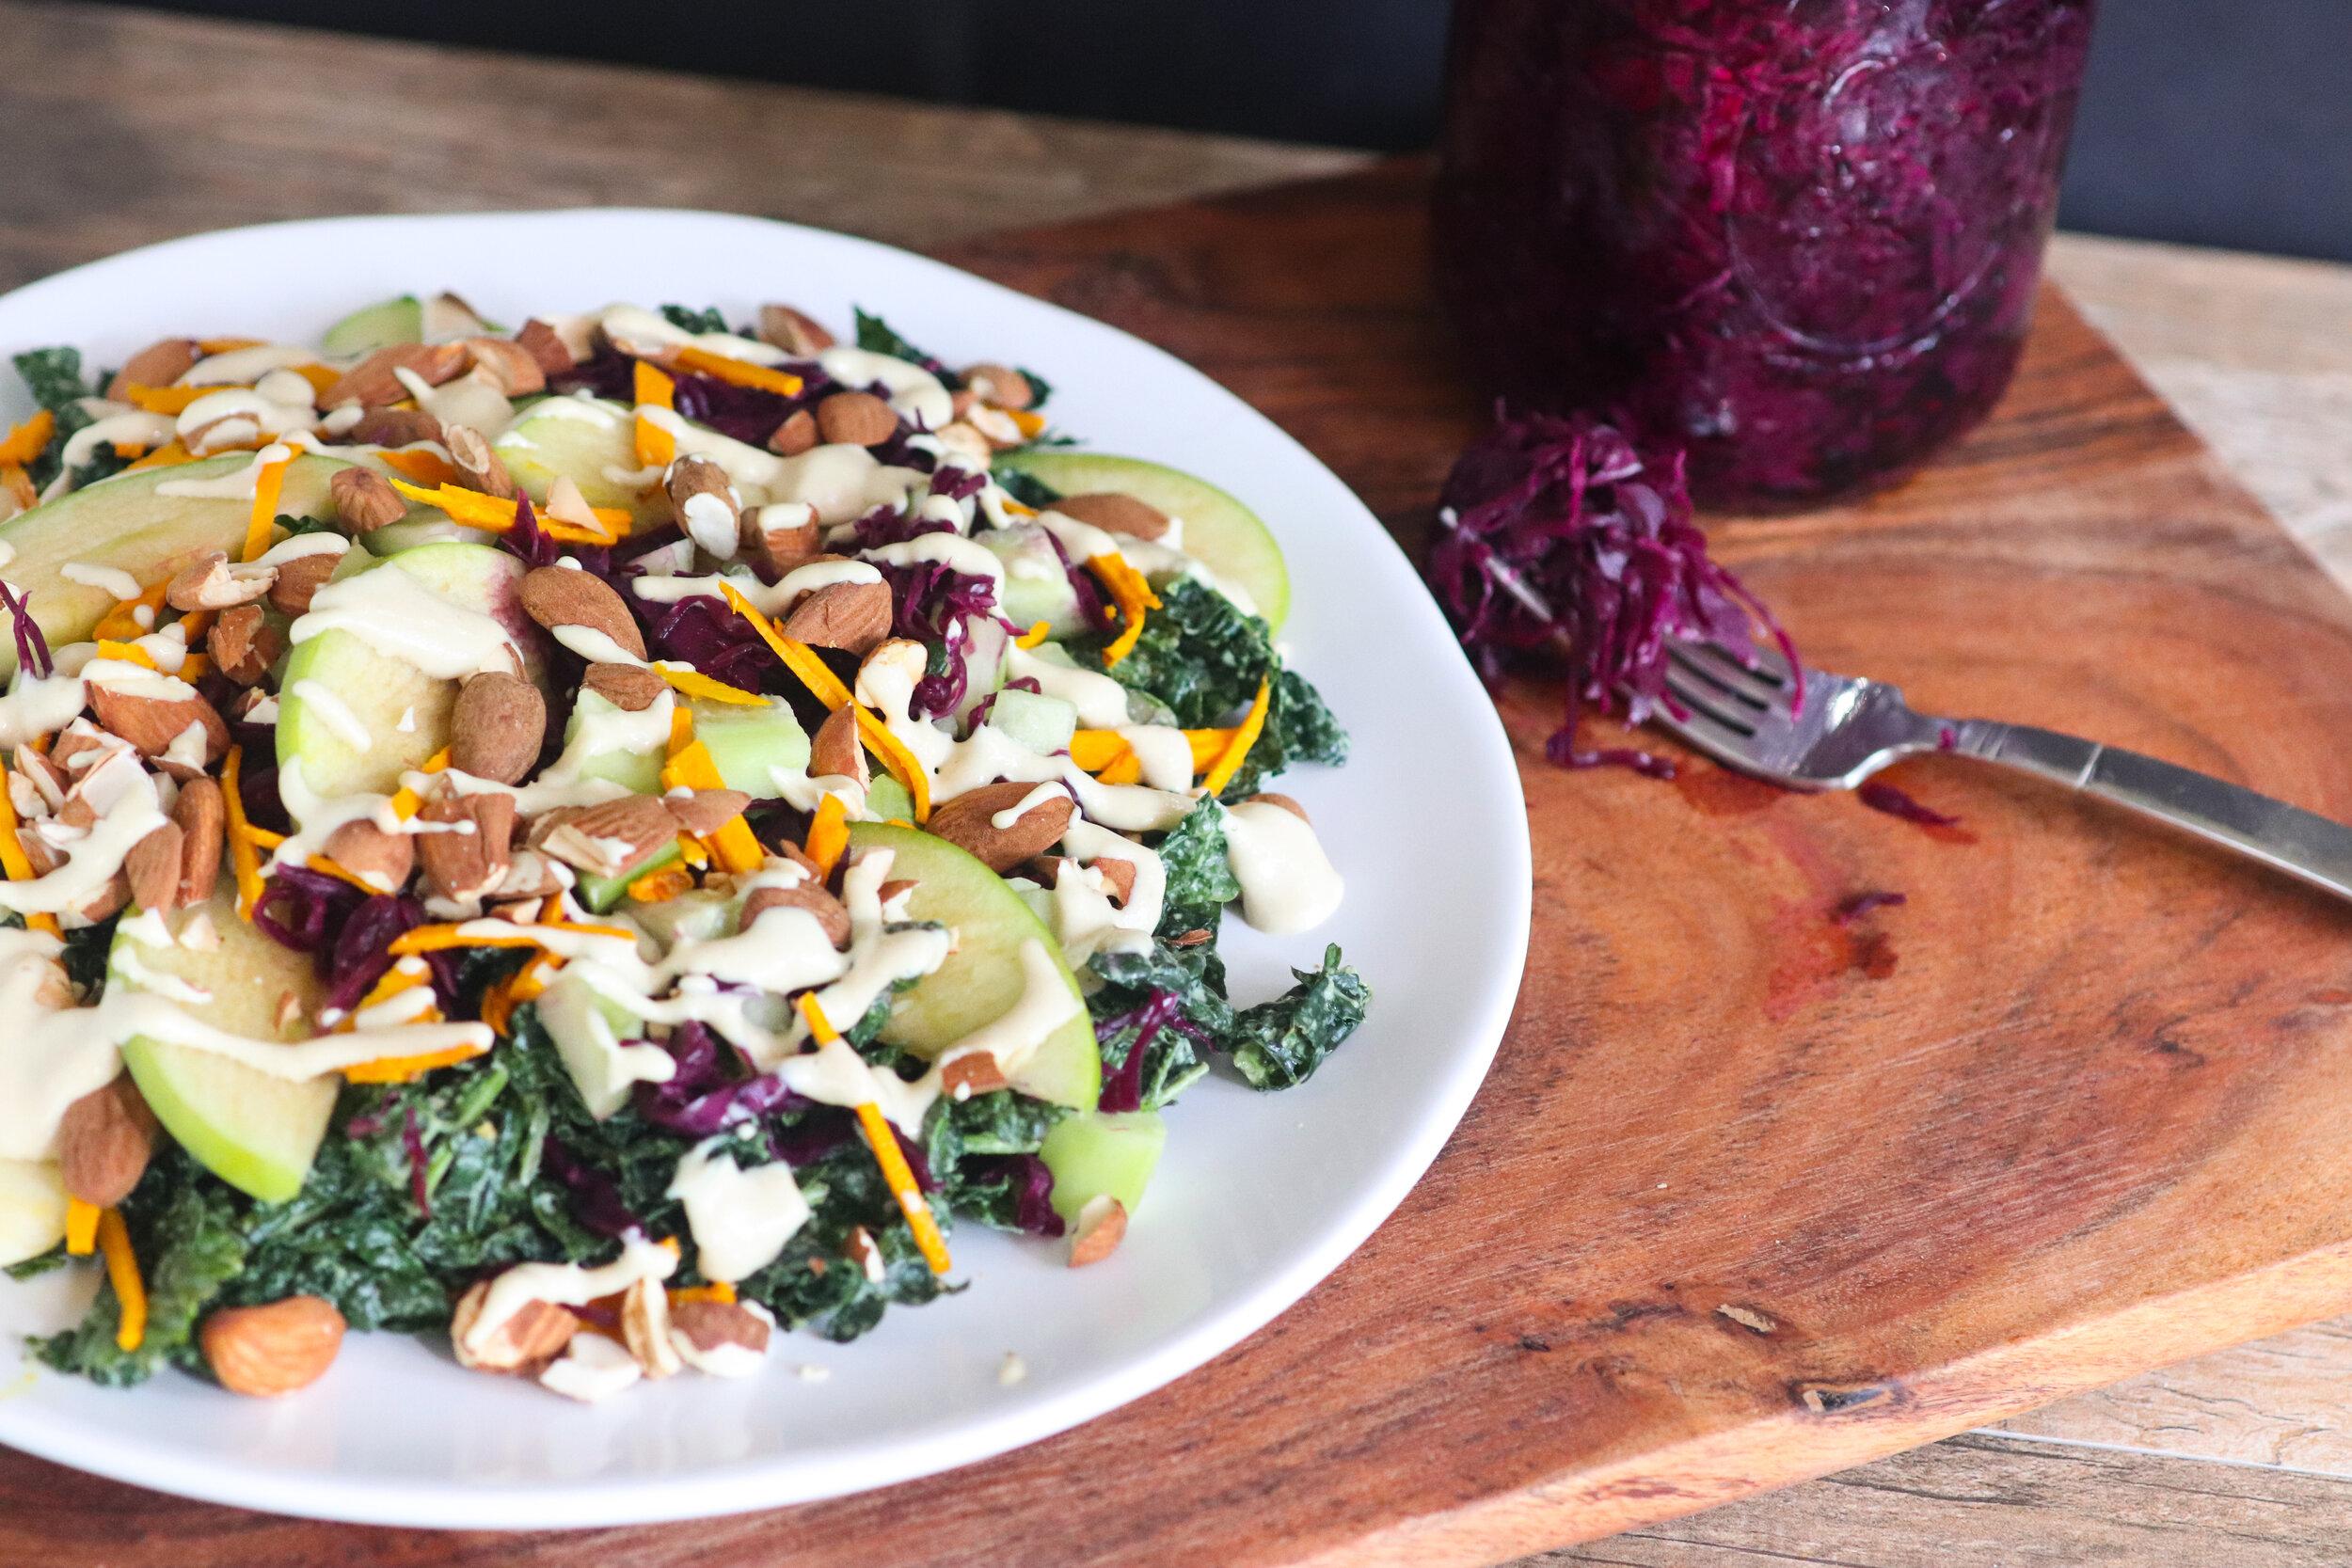 Plant based, vegan, pickled tumeric, massaged kale and apple salad, gluten free, oil free.jpg